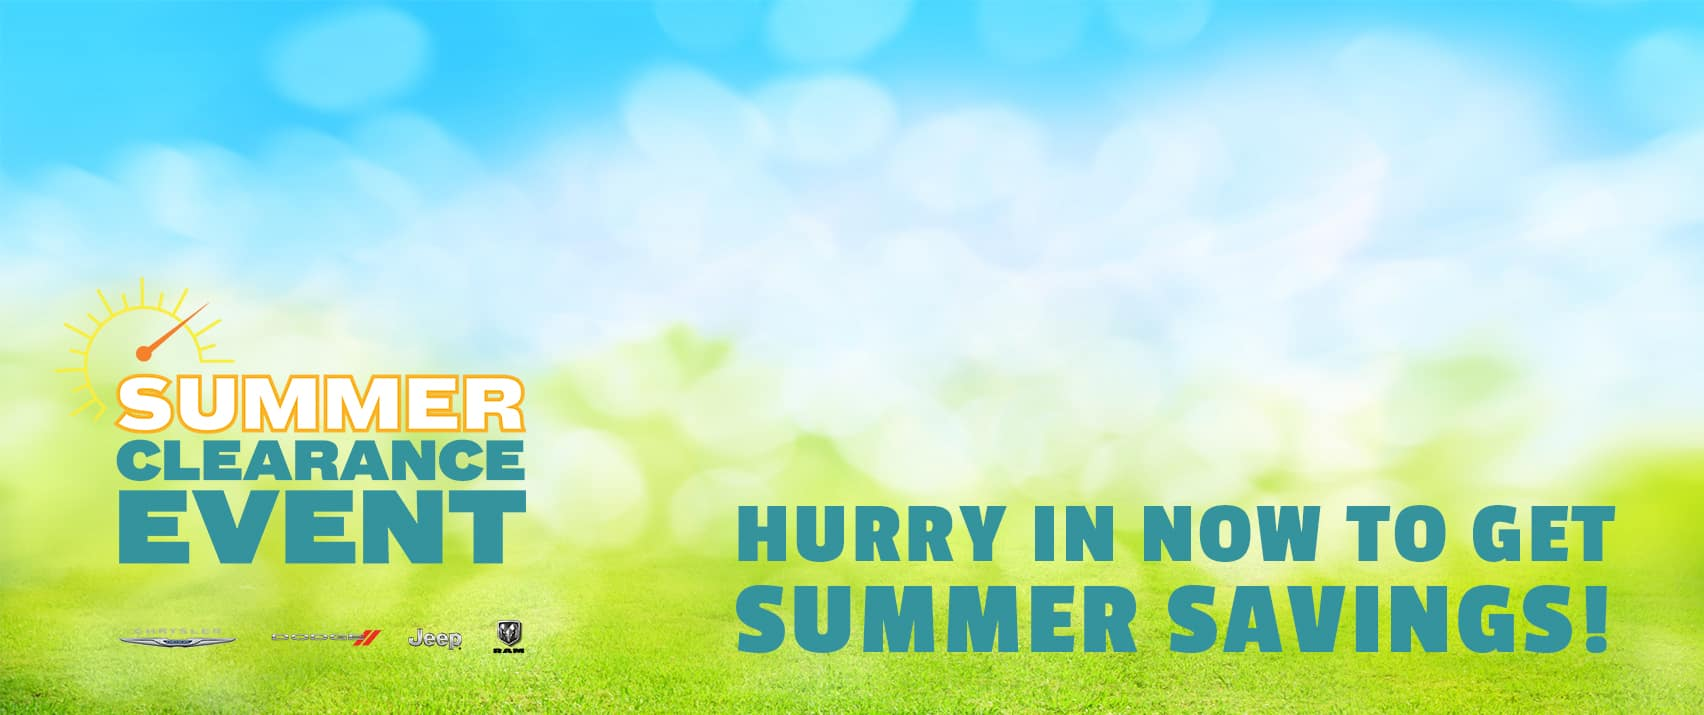 Summer Clearance Event at Mancari's